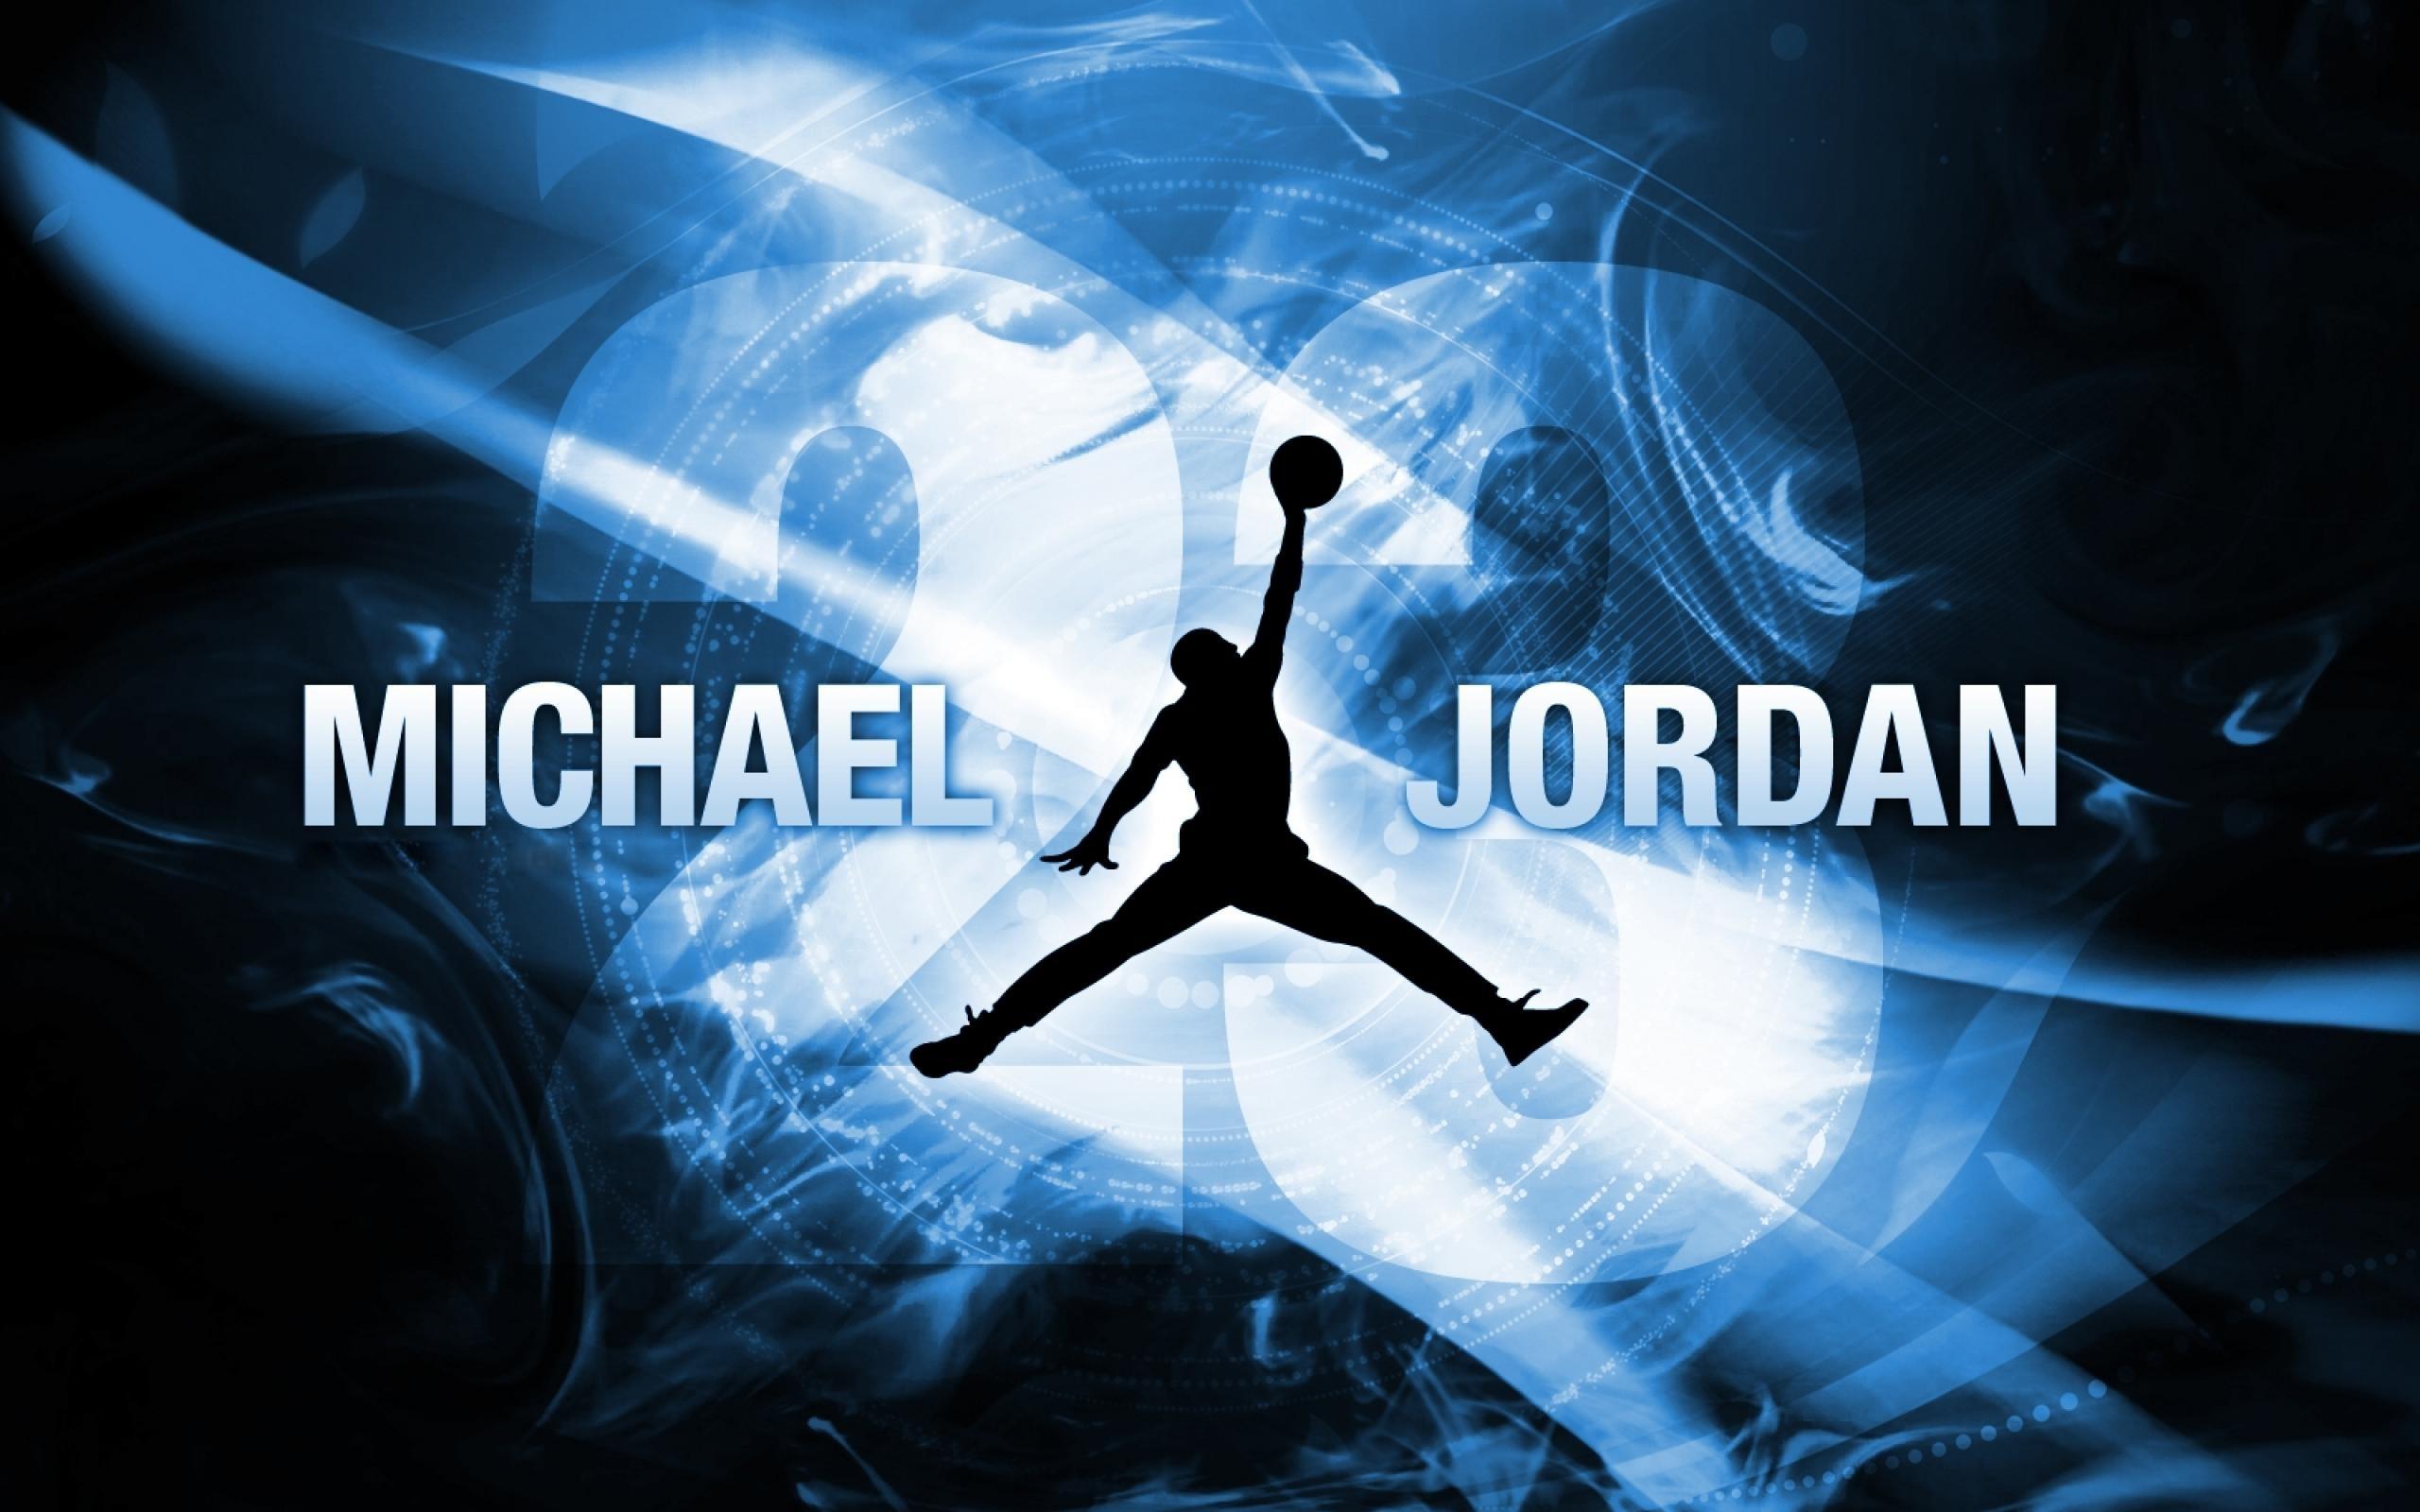 jordan logo wallpaper iphone 5